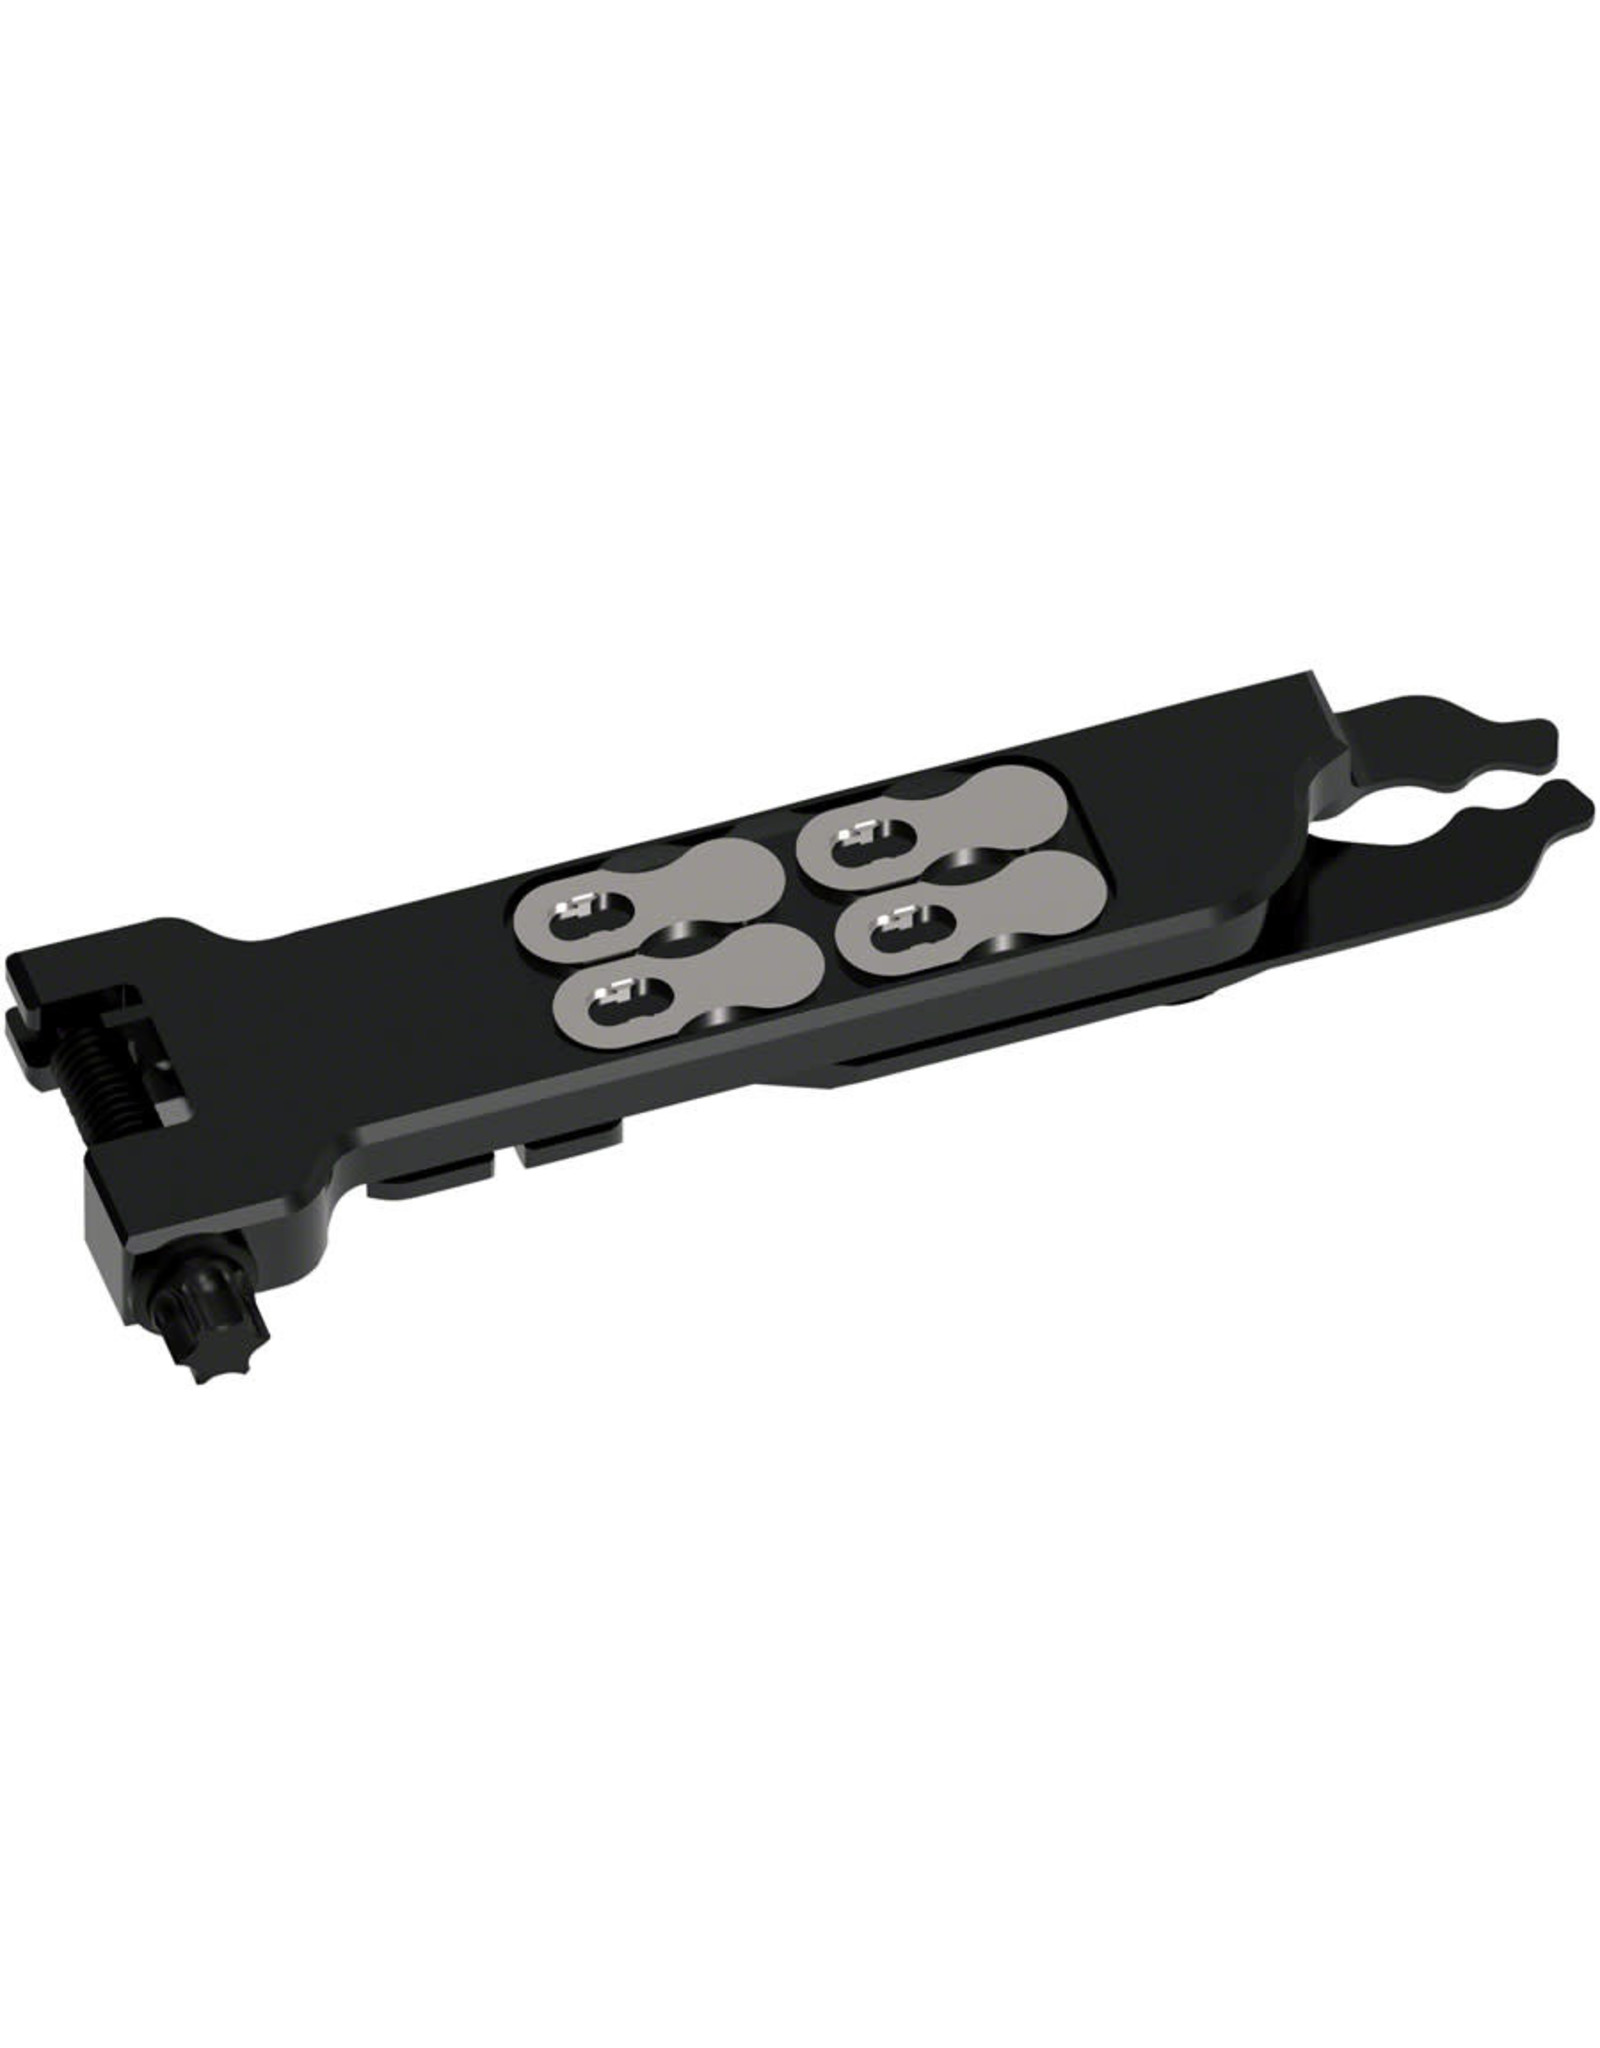 Lezyne Lezyne Chain Pliers Multi Tool, Black